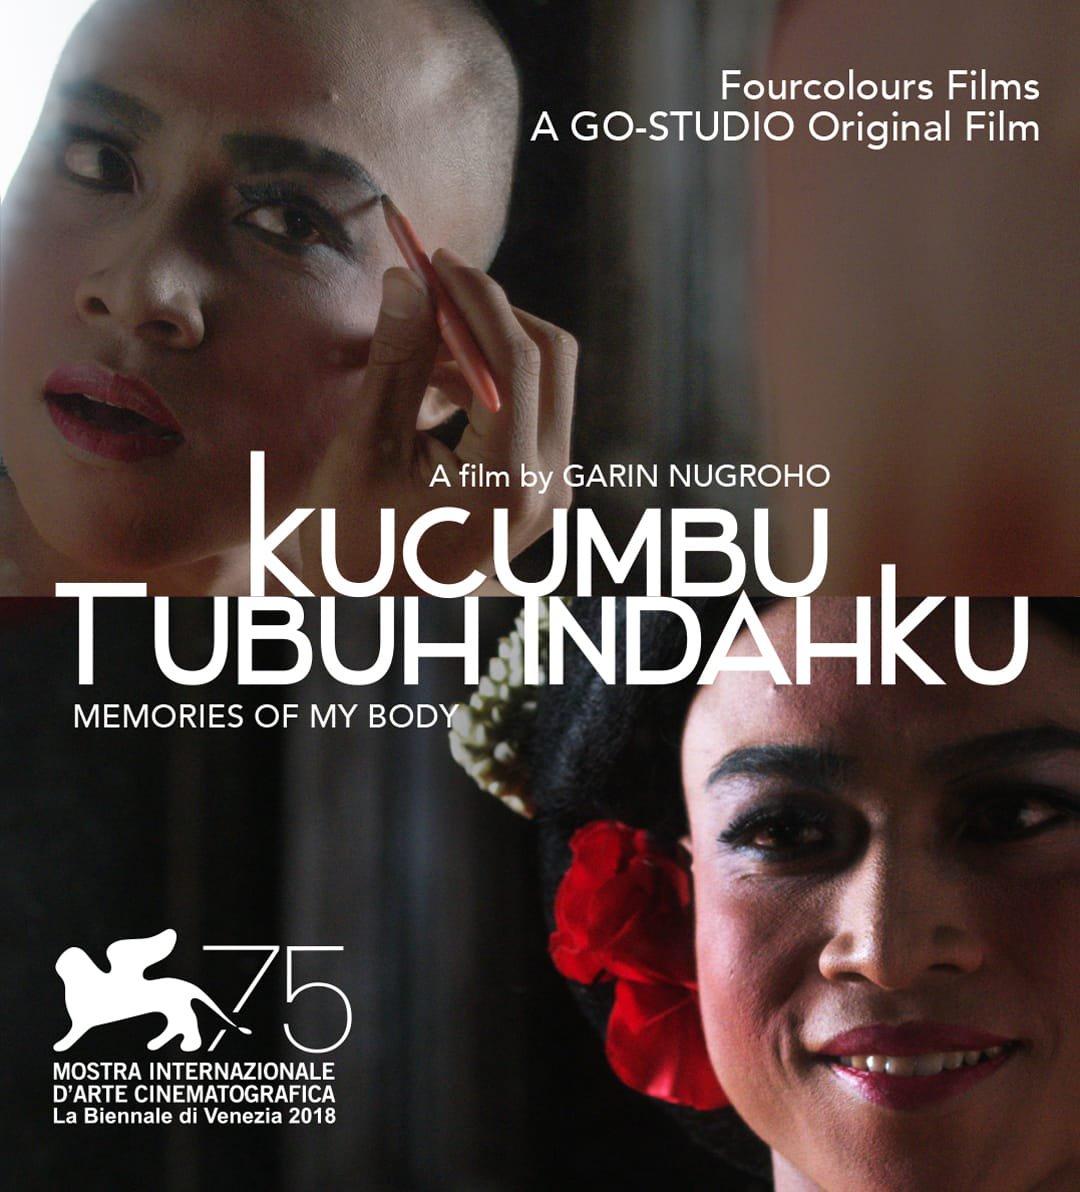 Familinia - Film Kucumbu Tubuh Indahku (2018)